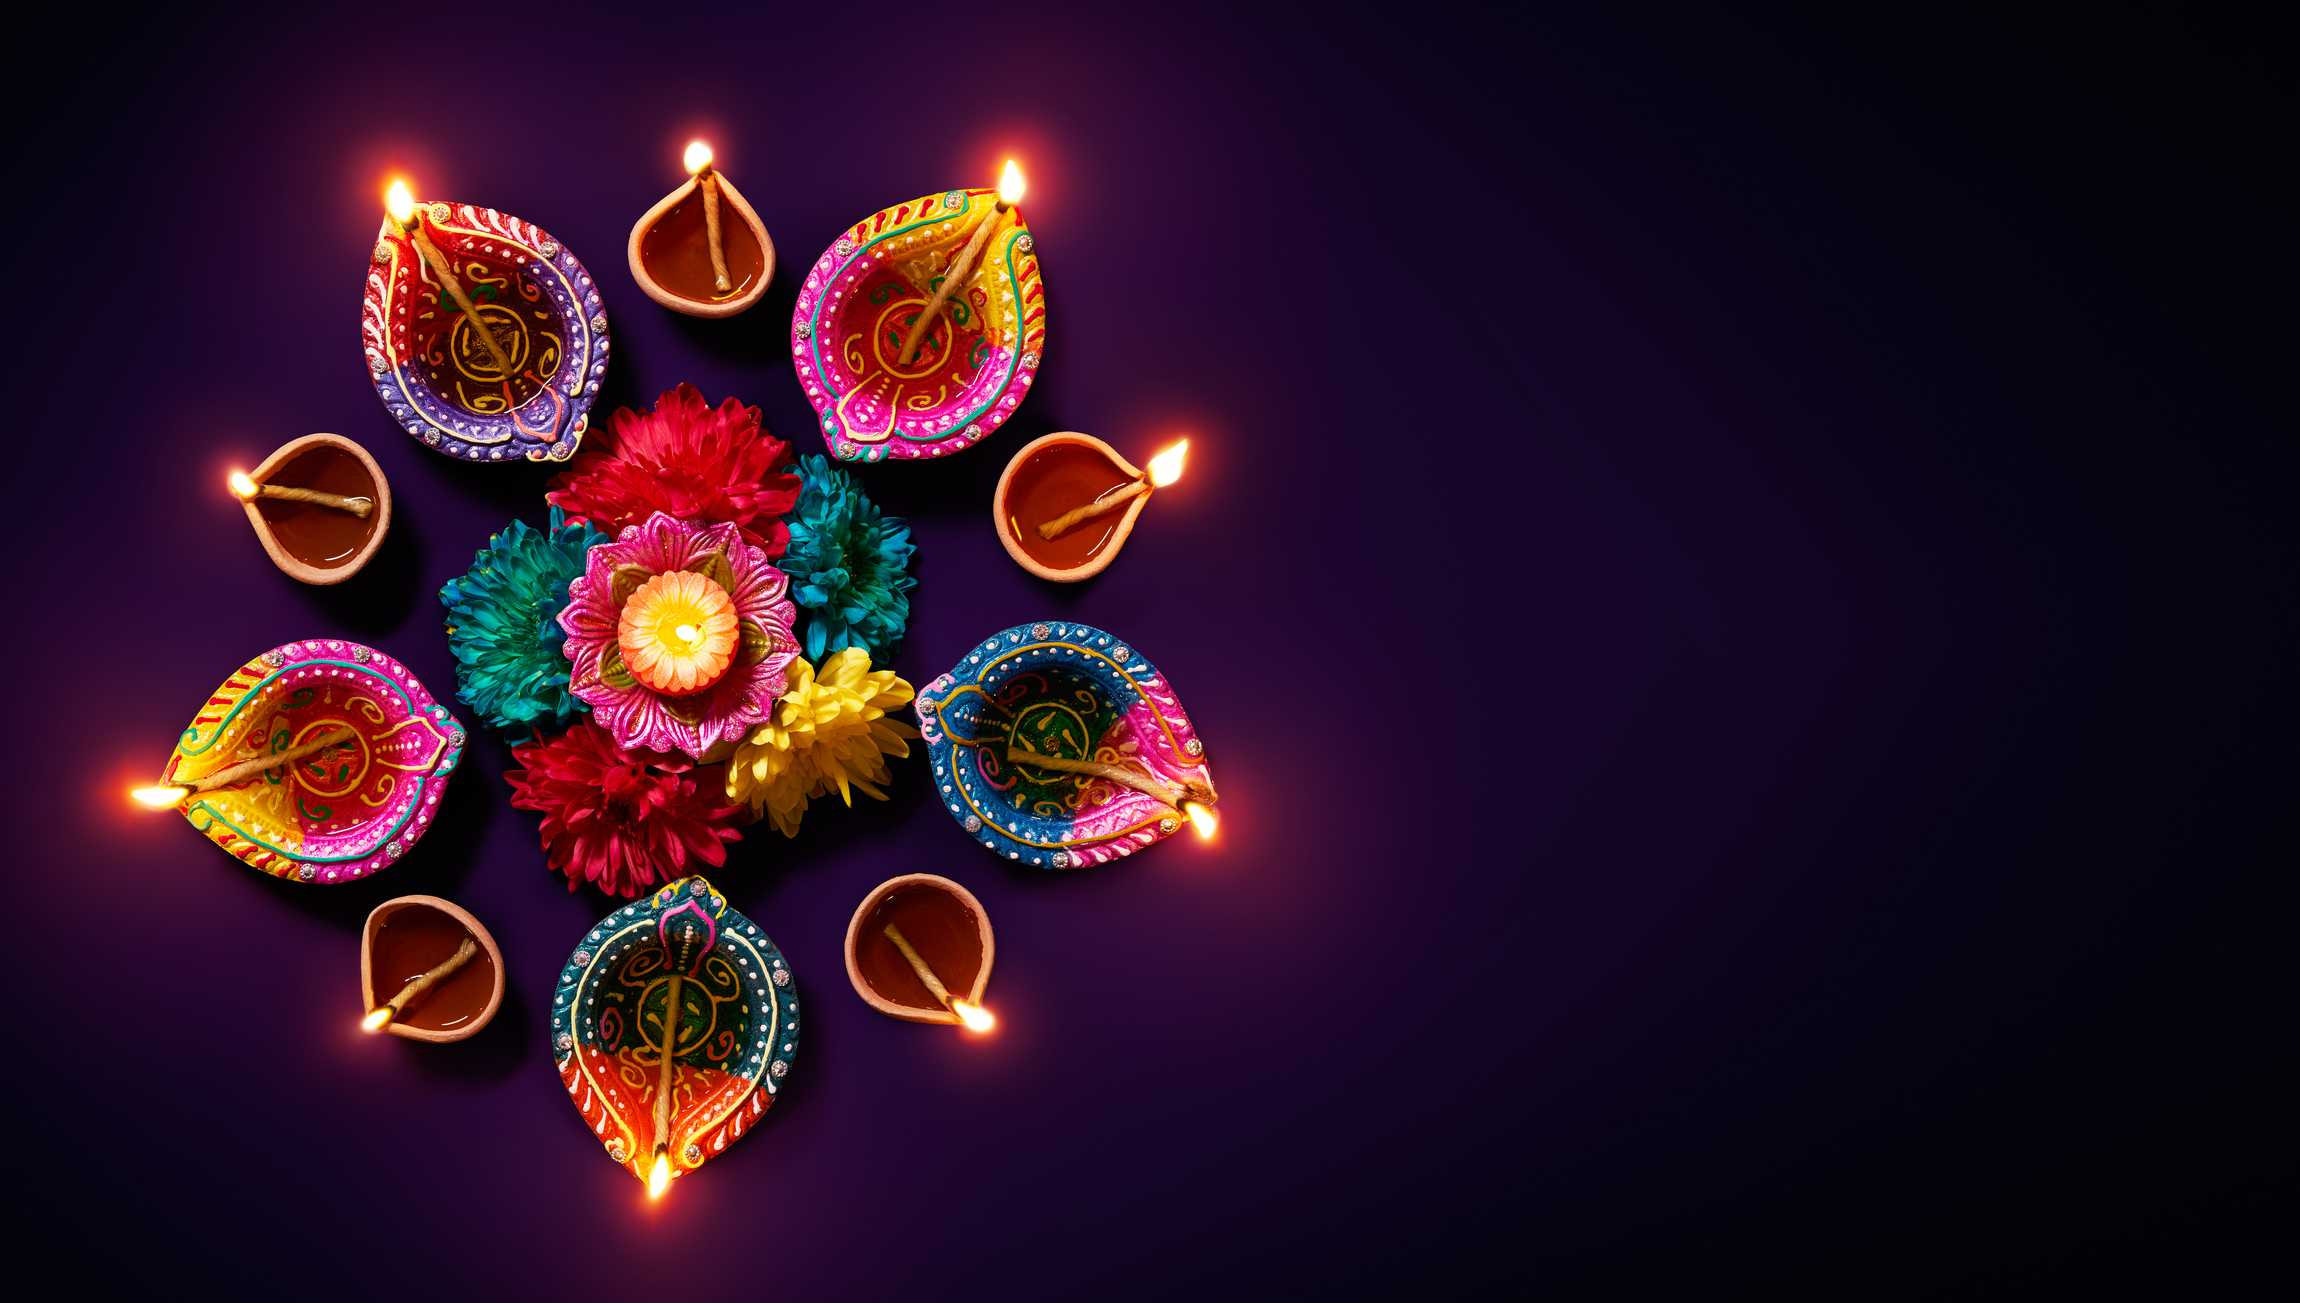 Diabetes and Diwali